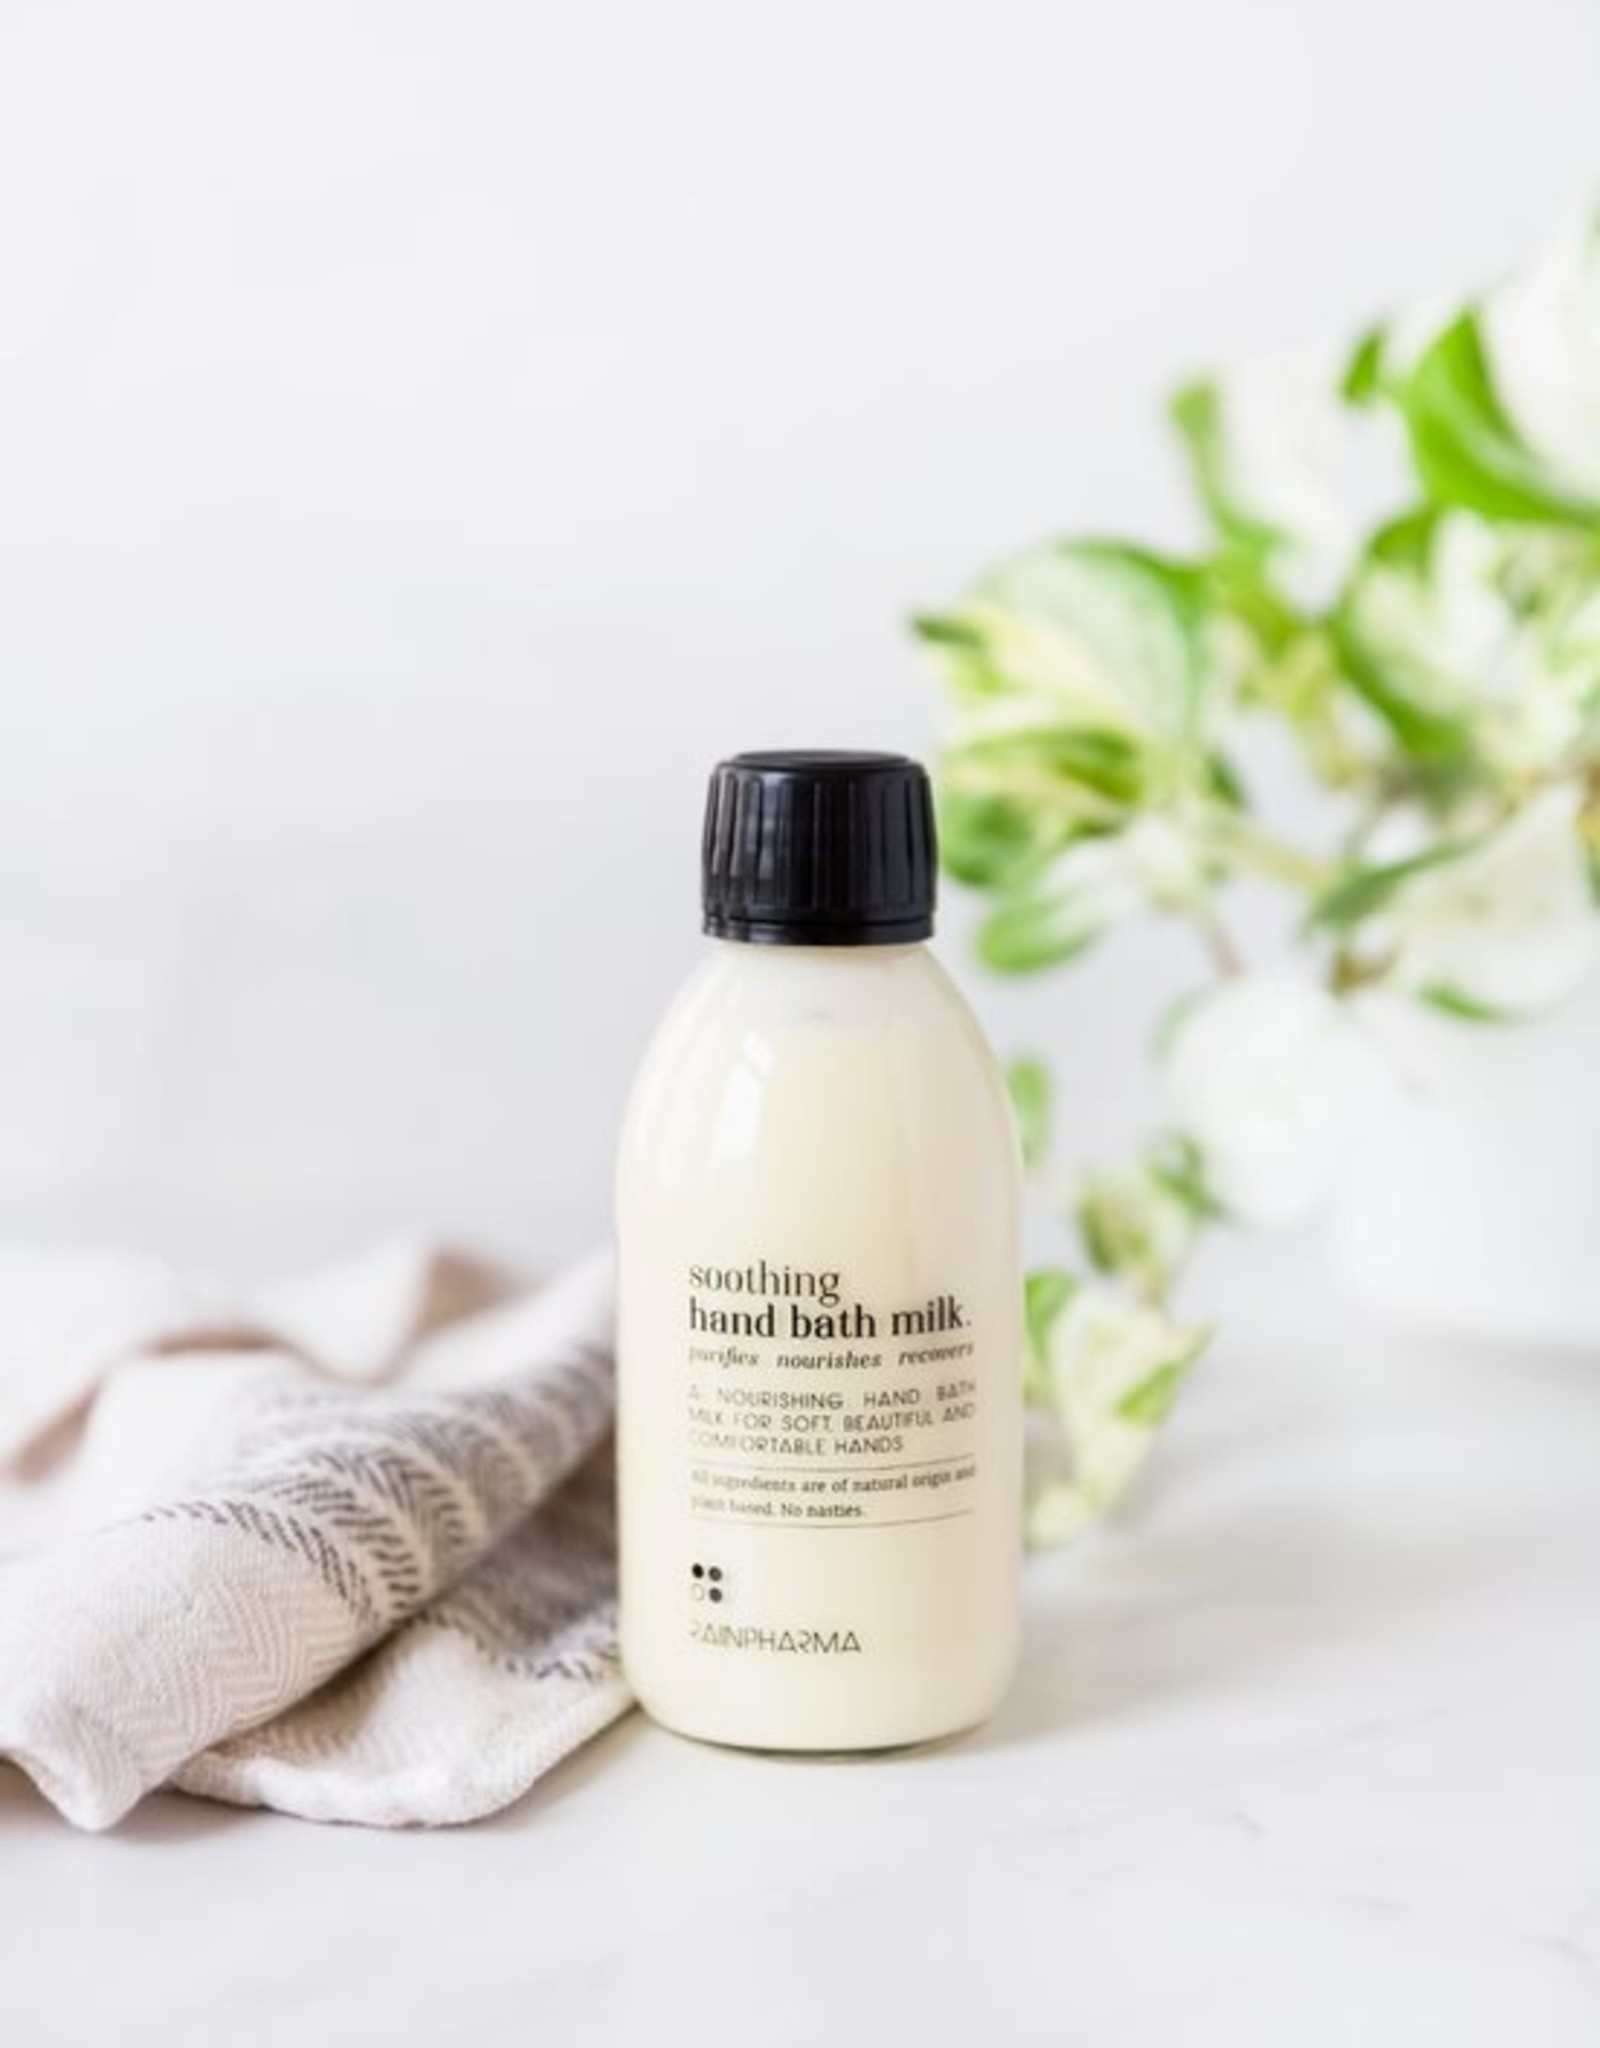 RainPharma Soothing Hand Bath Milk 200ml - Rainpharma